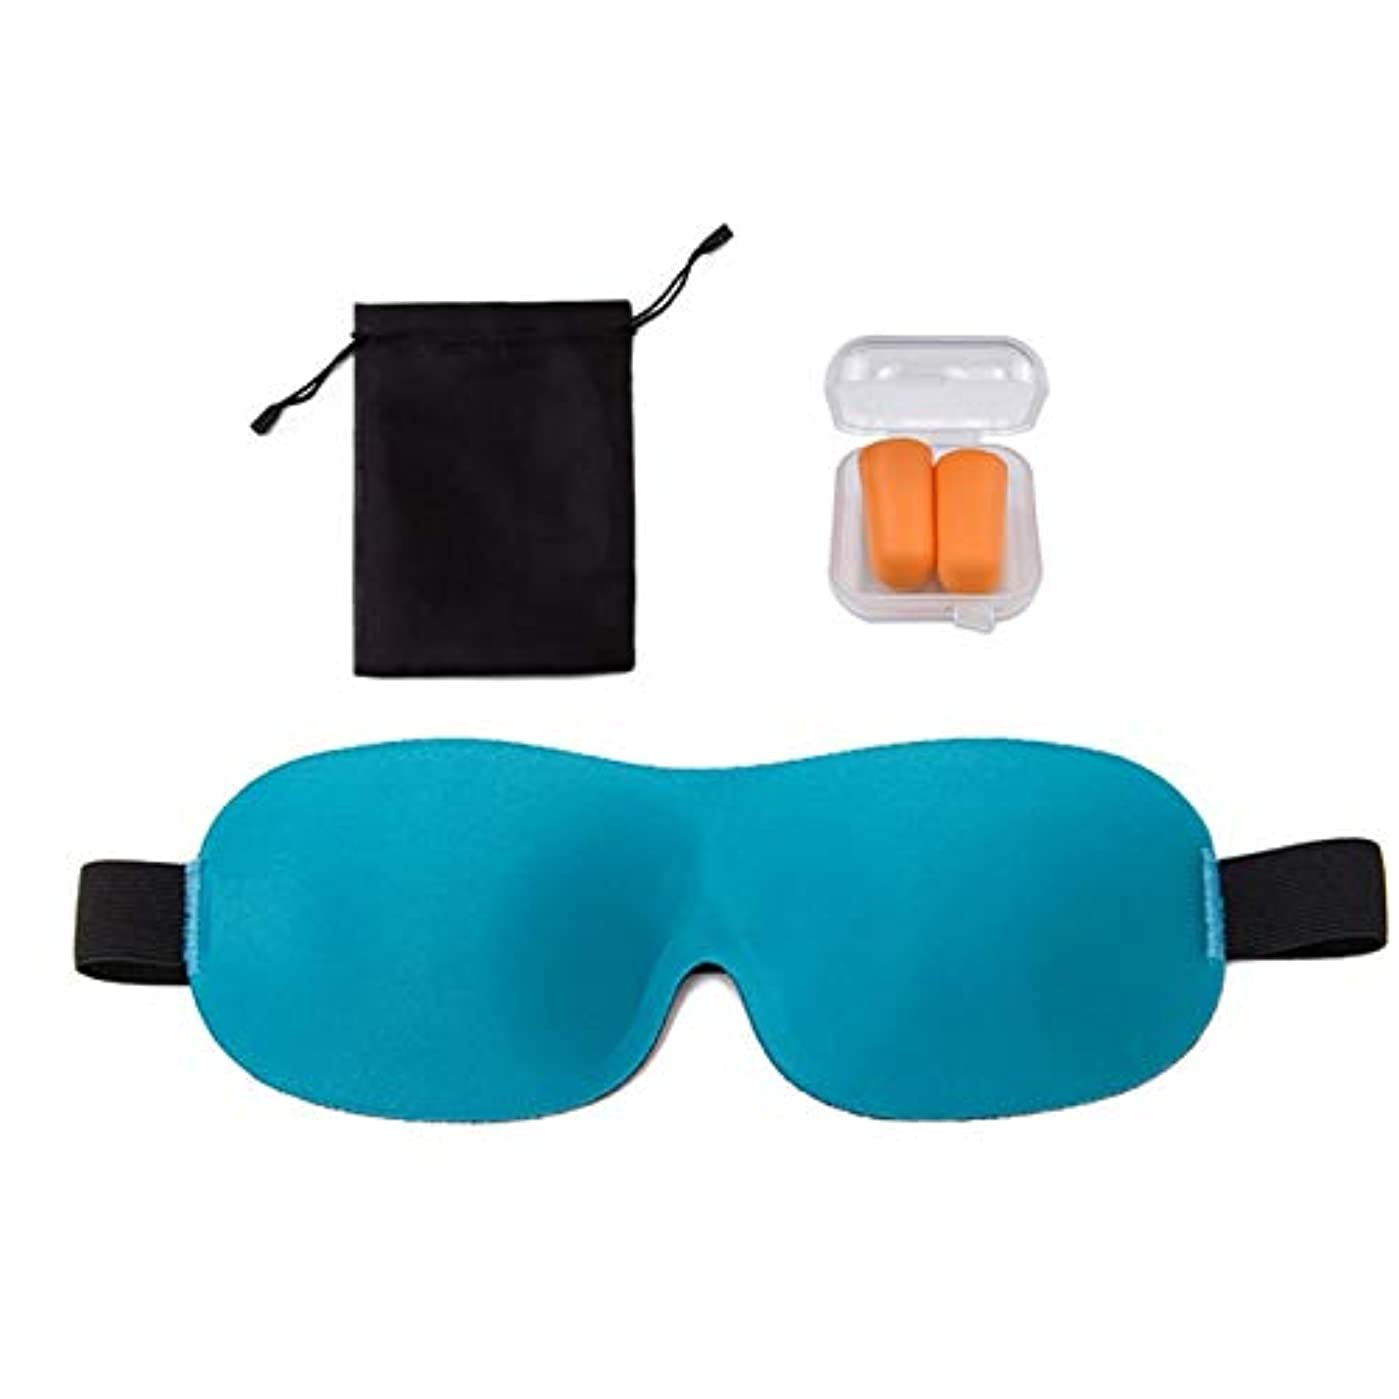 NOTE 3d睡眠マスクアイシャドーコンシーラー穏やかなナチュラルカバー目隠しアイシェードマスク睡眠旅行オフィスアイ減圧ツール